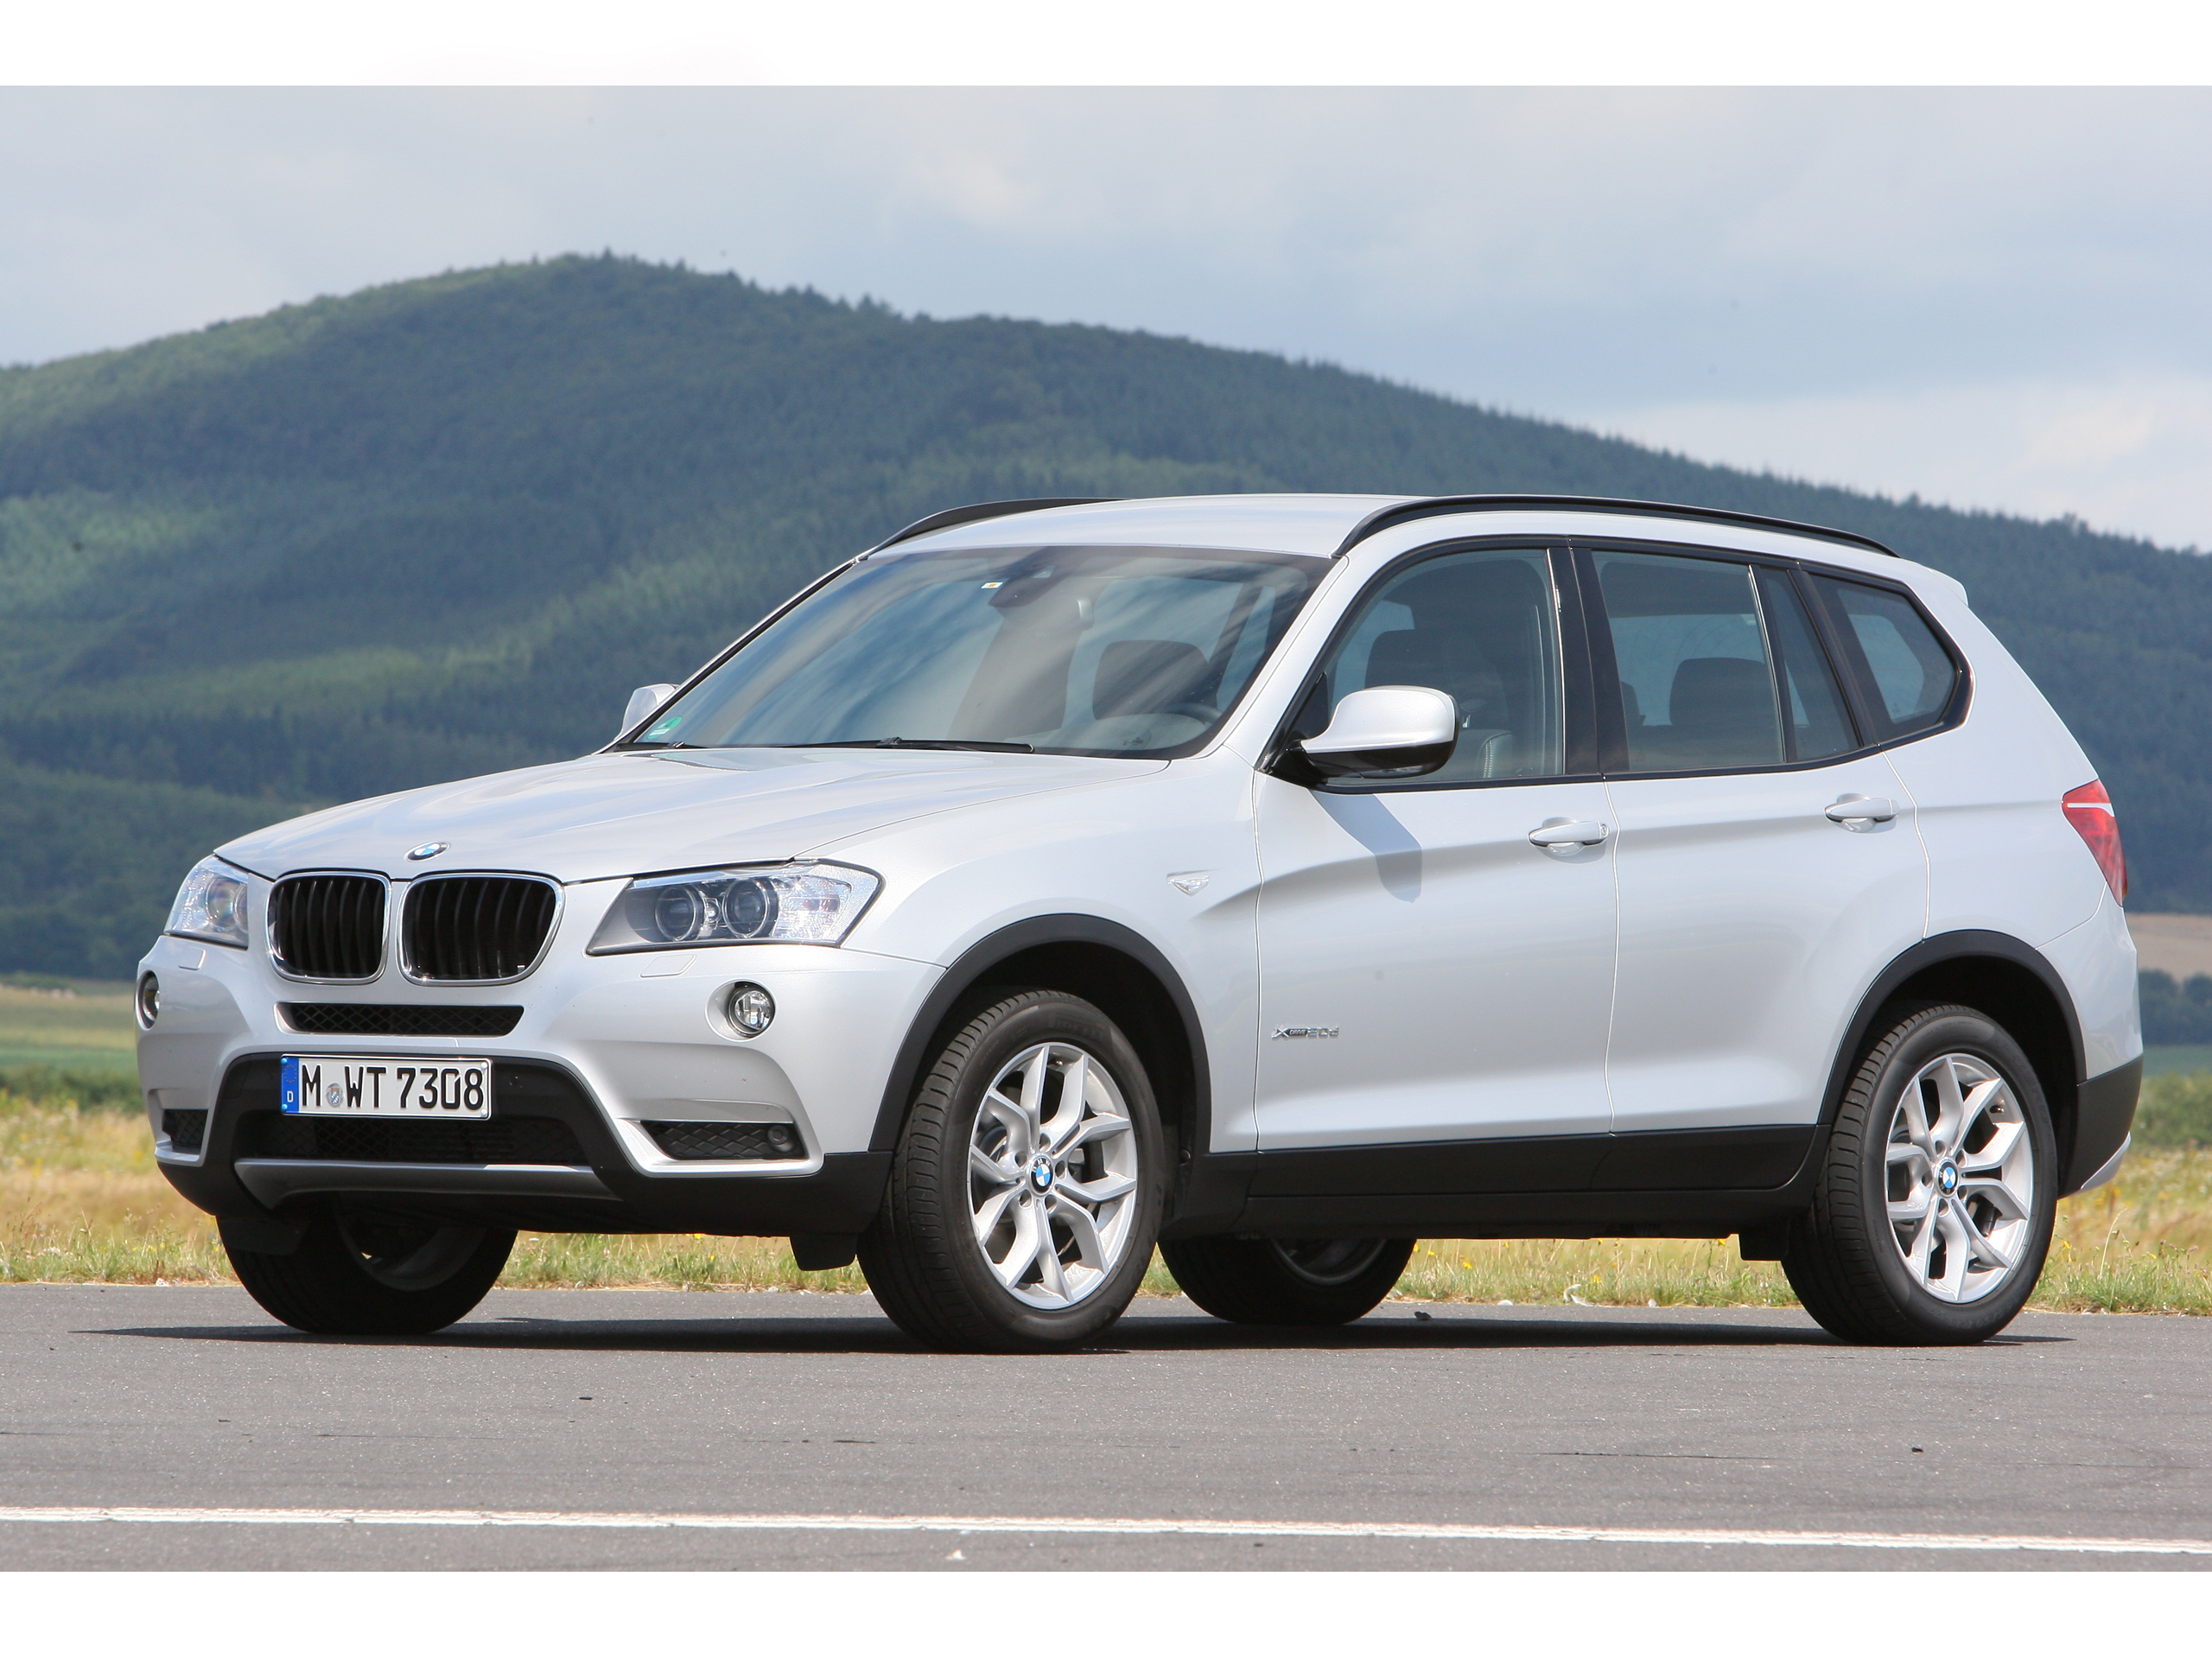 SUV Vergleich 2012 BMW X1 xDrive 20d gegen BMW X3 xDrive 20d